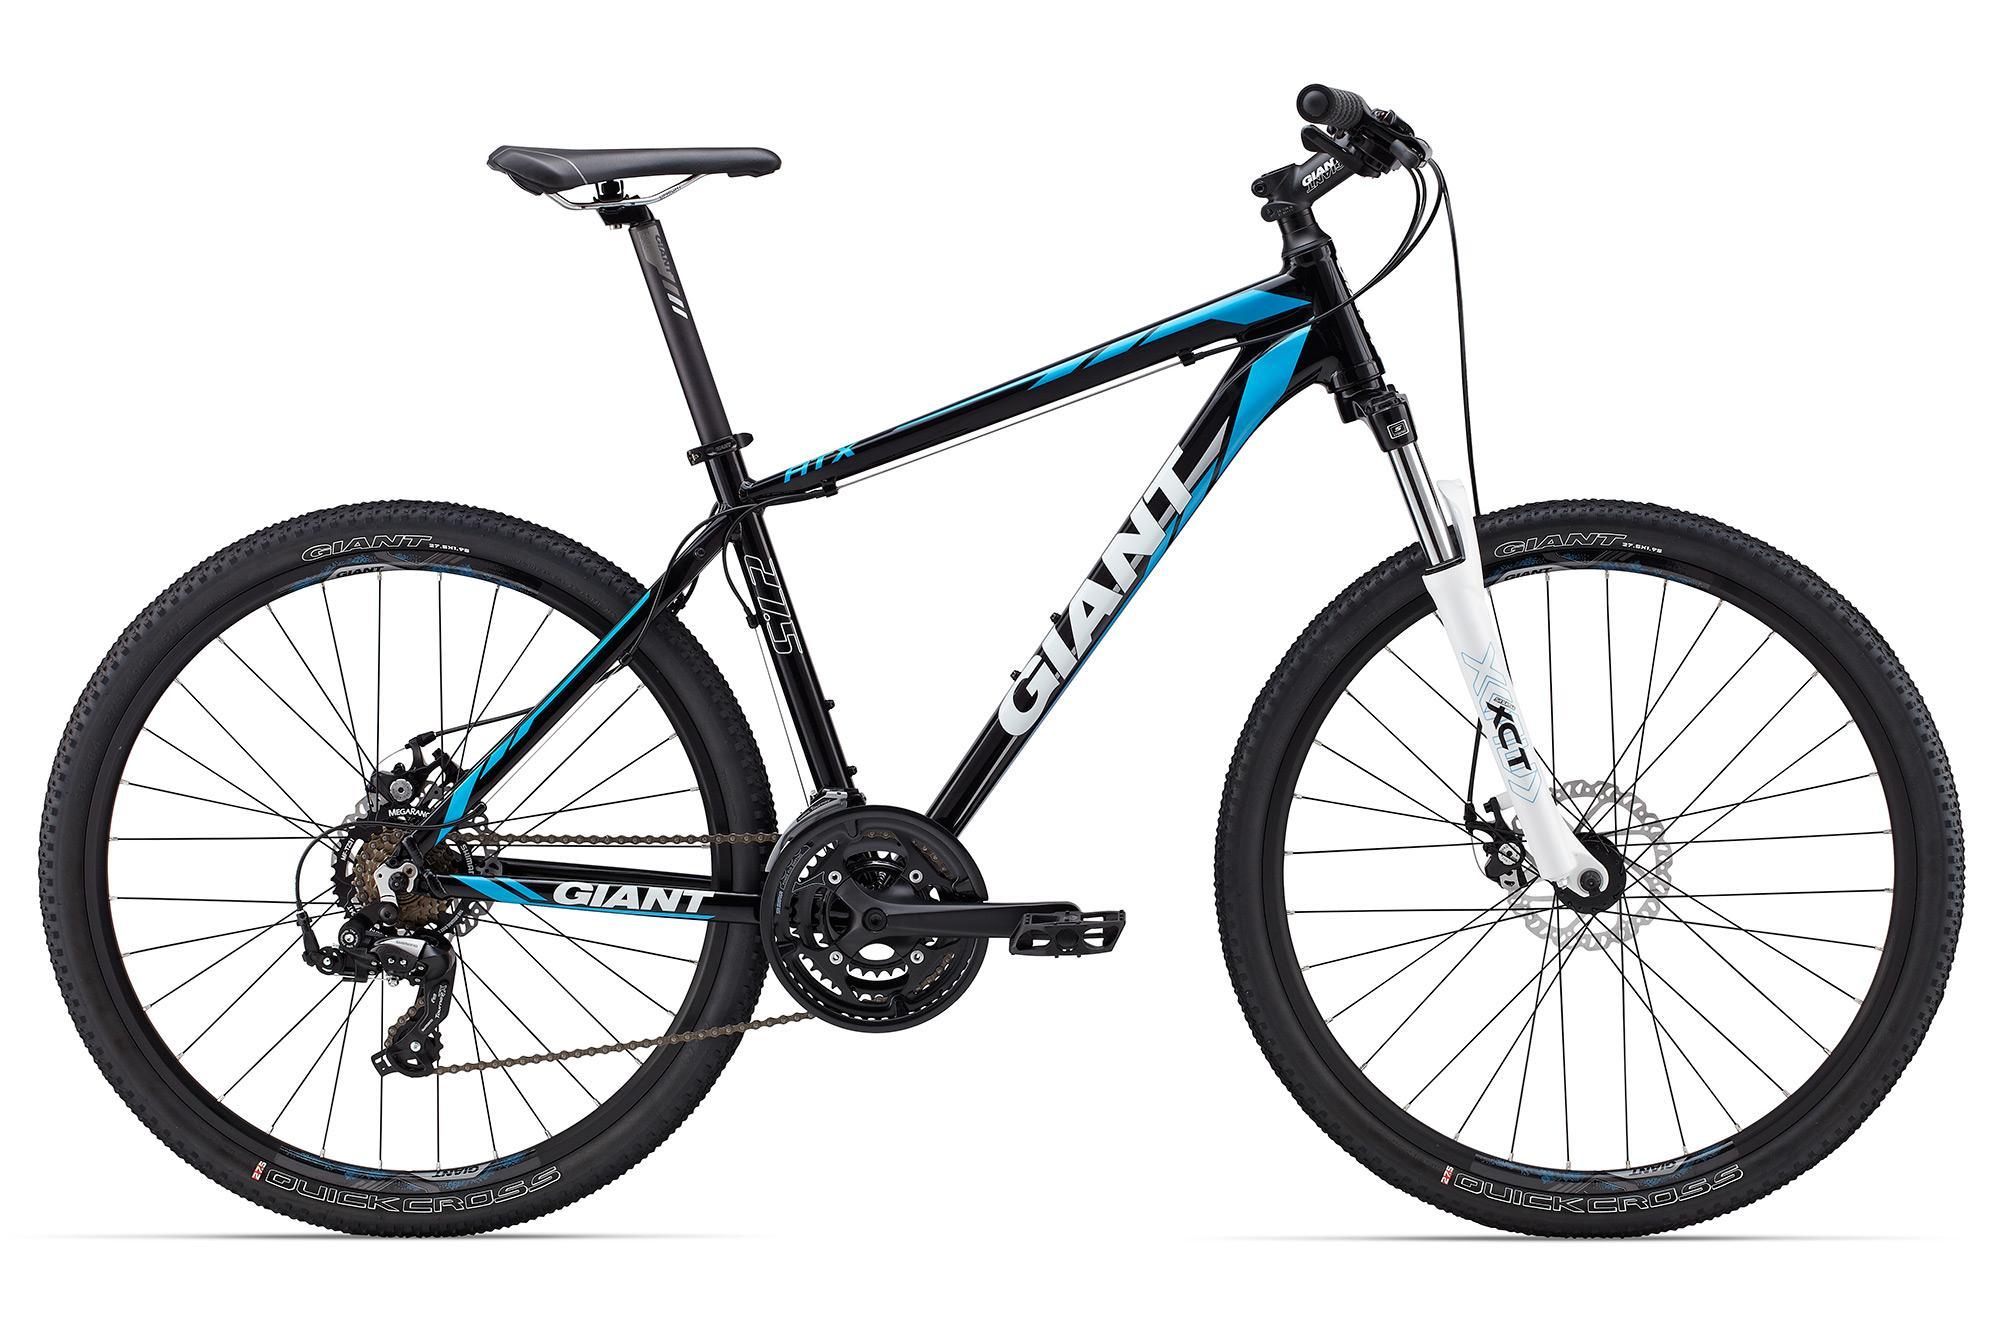 Xe dap the thao dia hinh GIANT XTC Advanced SL 27.5, xe dap the thao, xe dap trinx, xe đạp thể thao chính hãng, xe dap asama, ATX 27 5 2 black blue